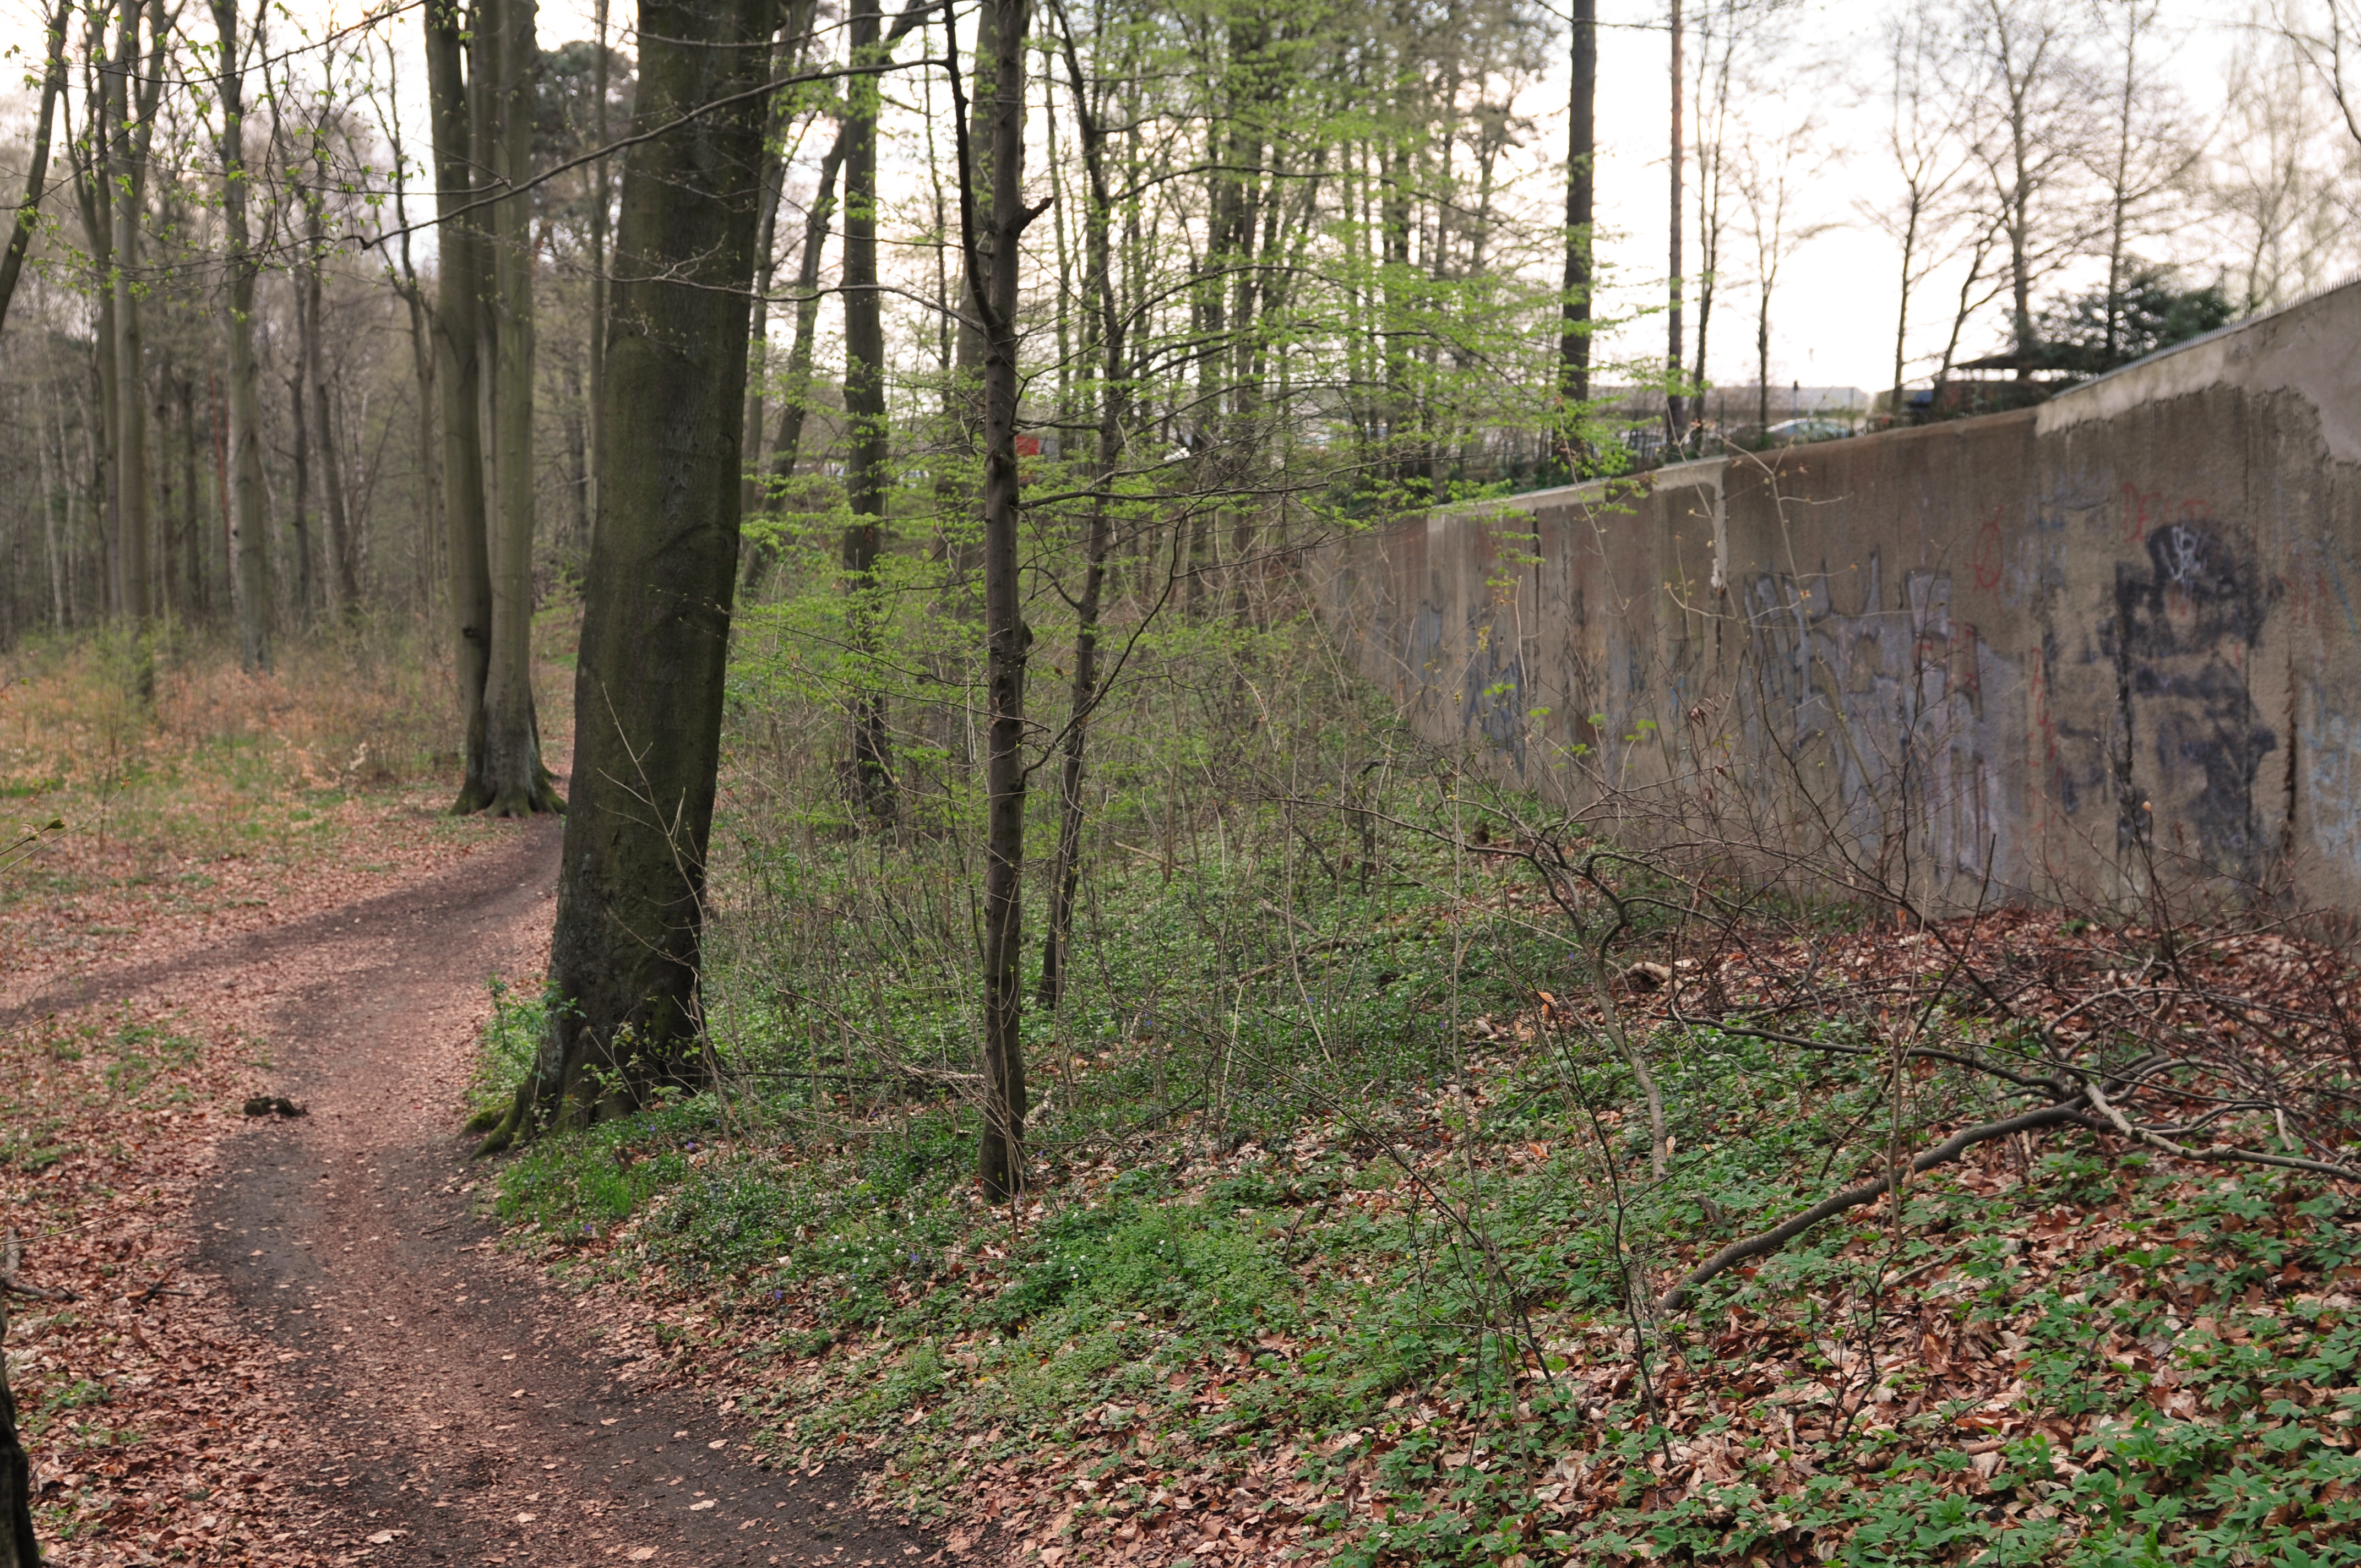 14-04-07-franzosenbunker-eberswalde-31.jpg